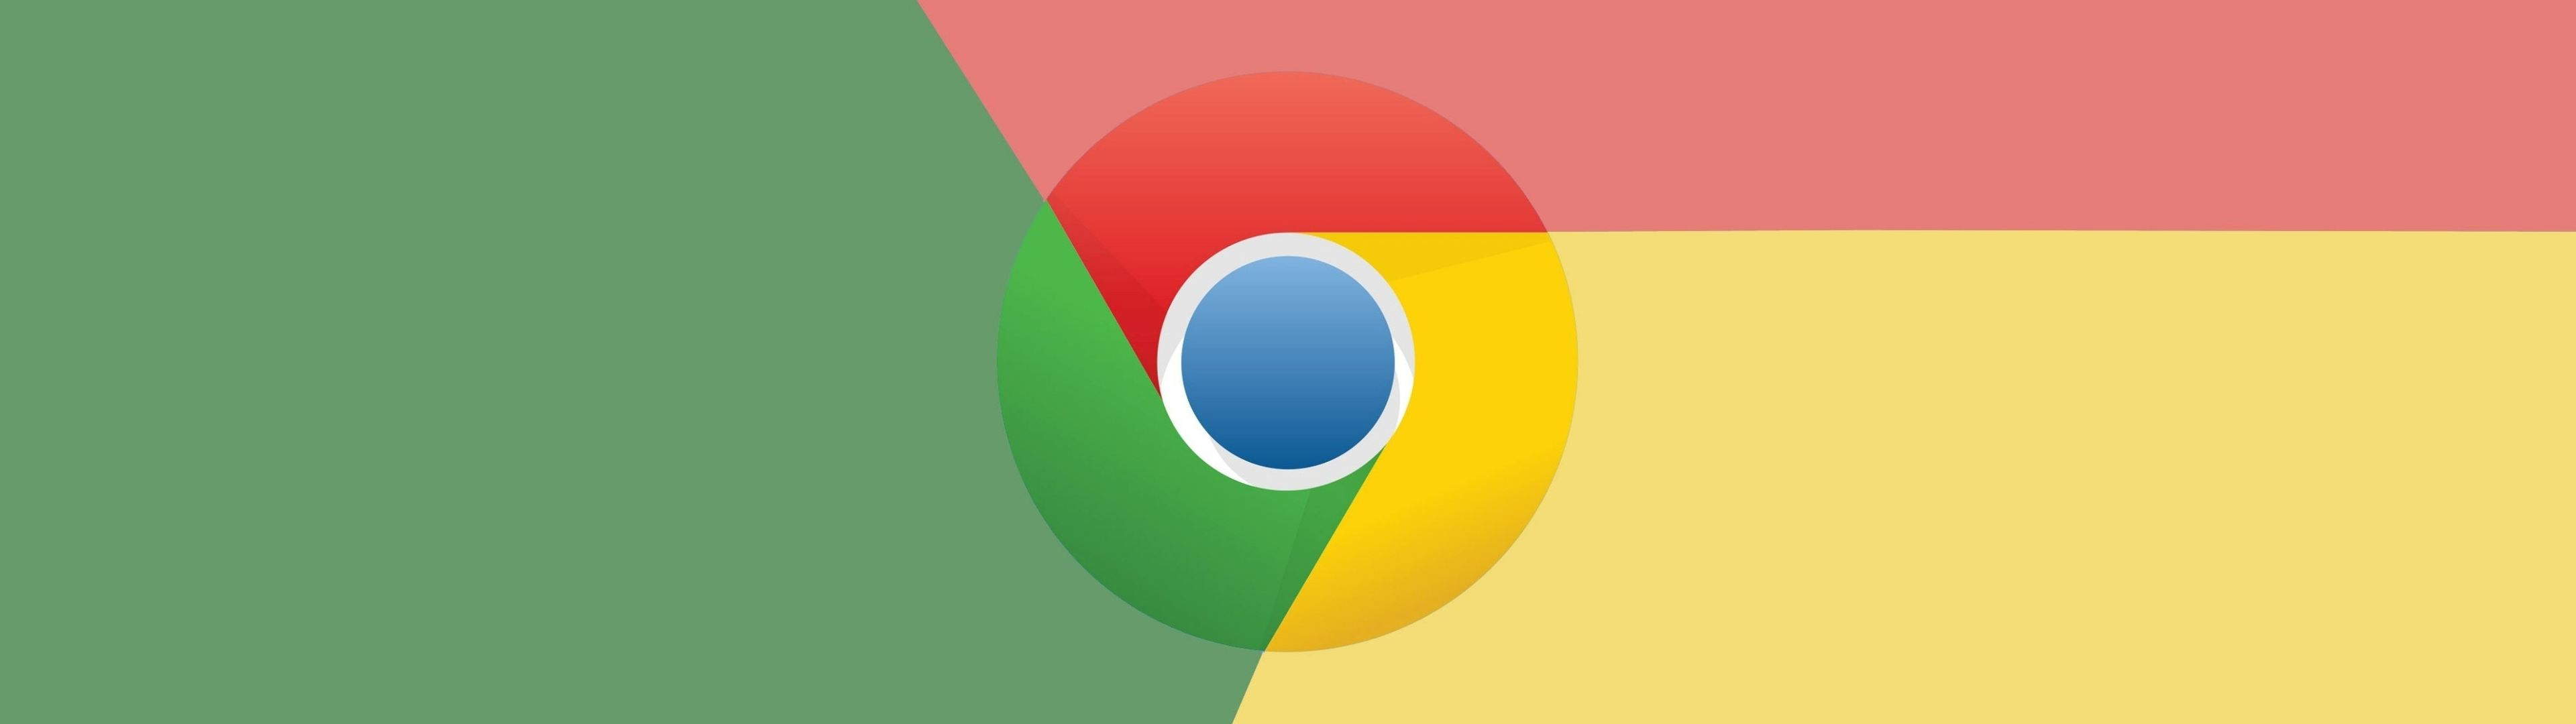 WallpaperFusion-google-chrome-logo-flat-3840x1080.jpg